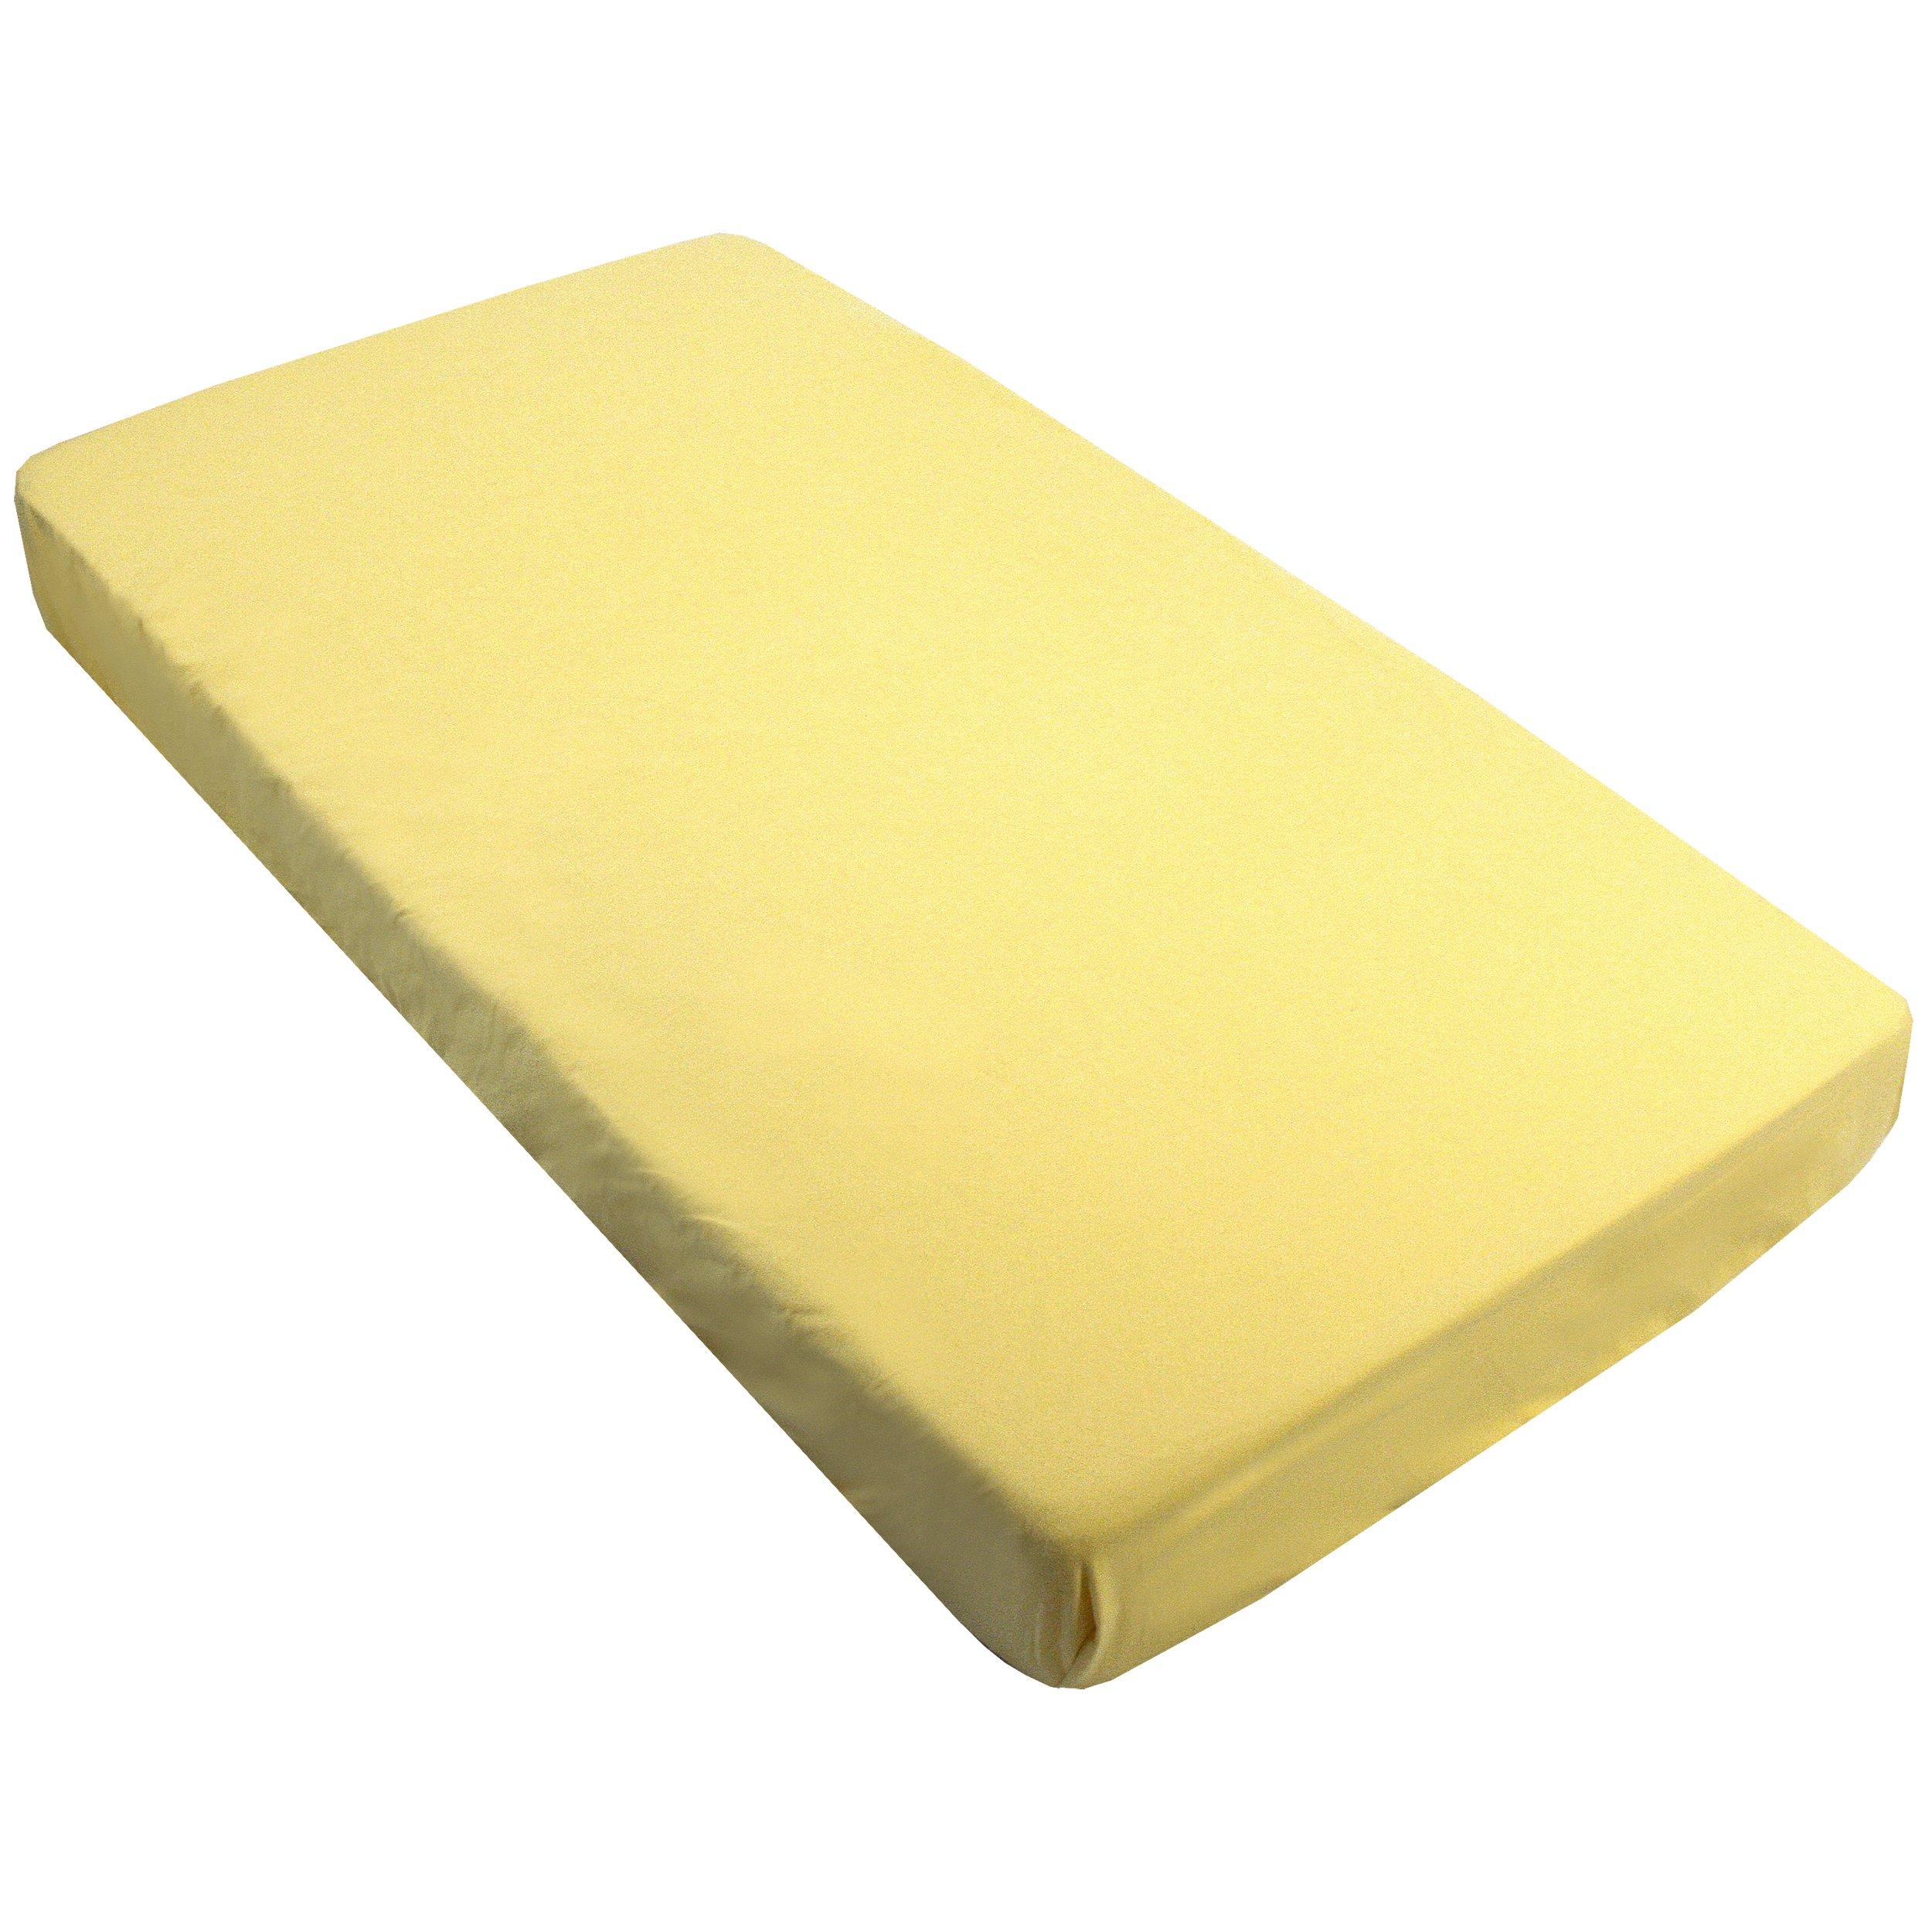 Kushies Fitted Bassinet Sheet, Yellow